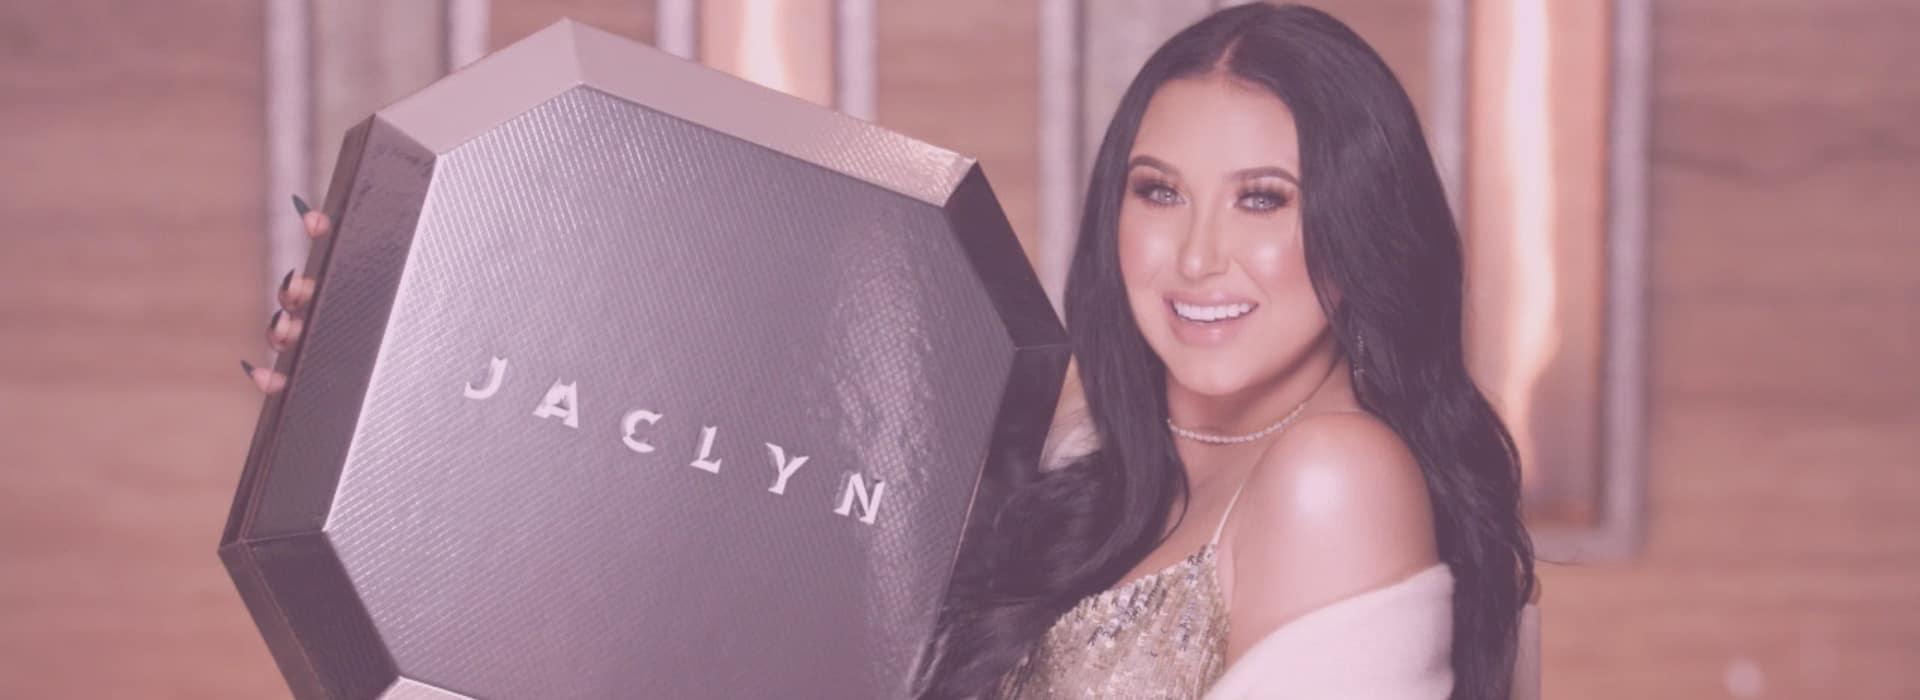 jaclyn-hill-cosmetics-hp